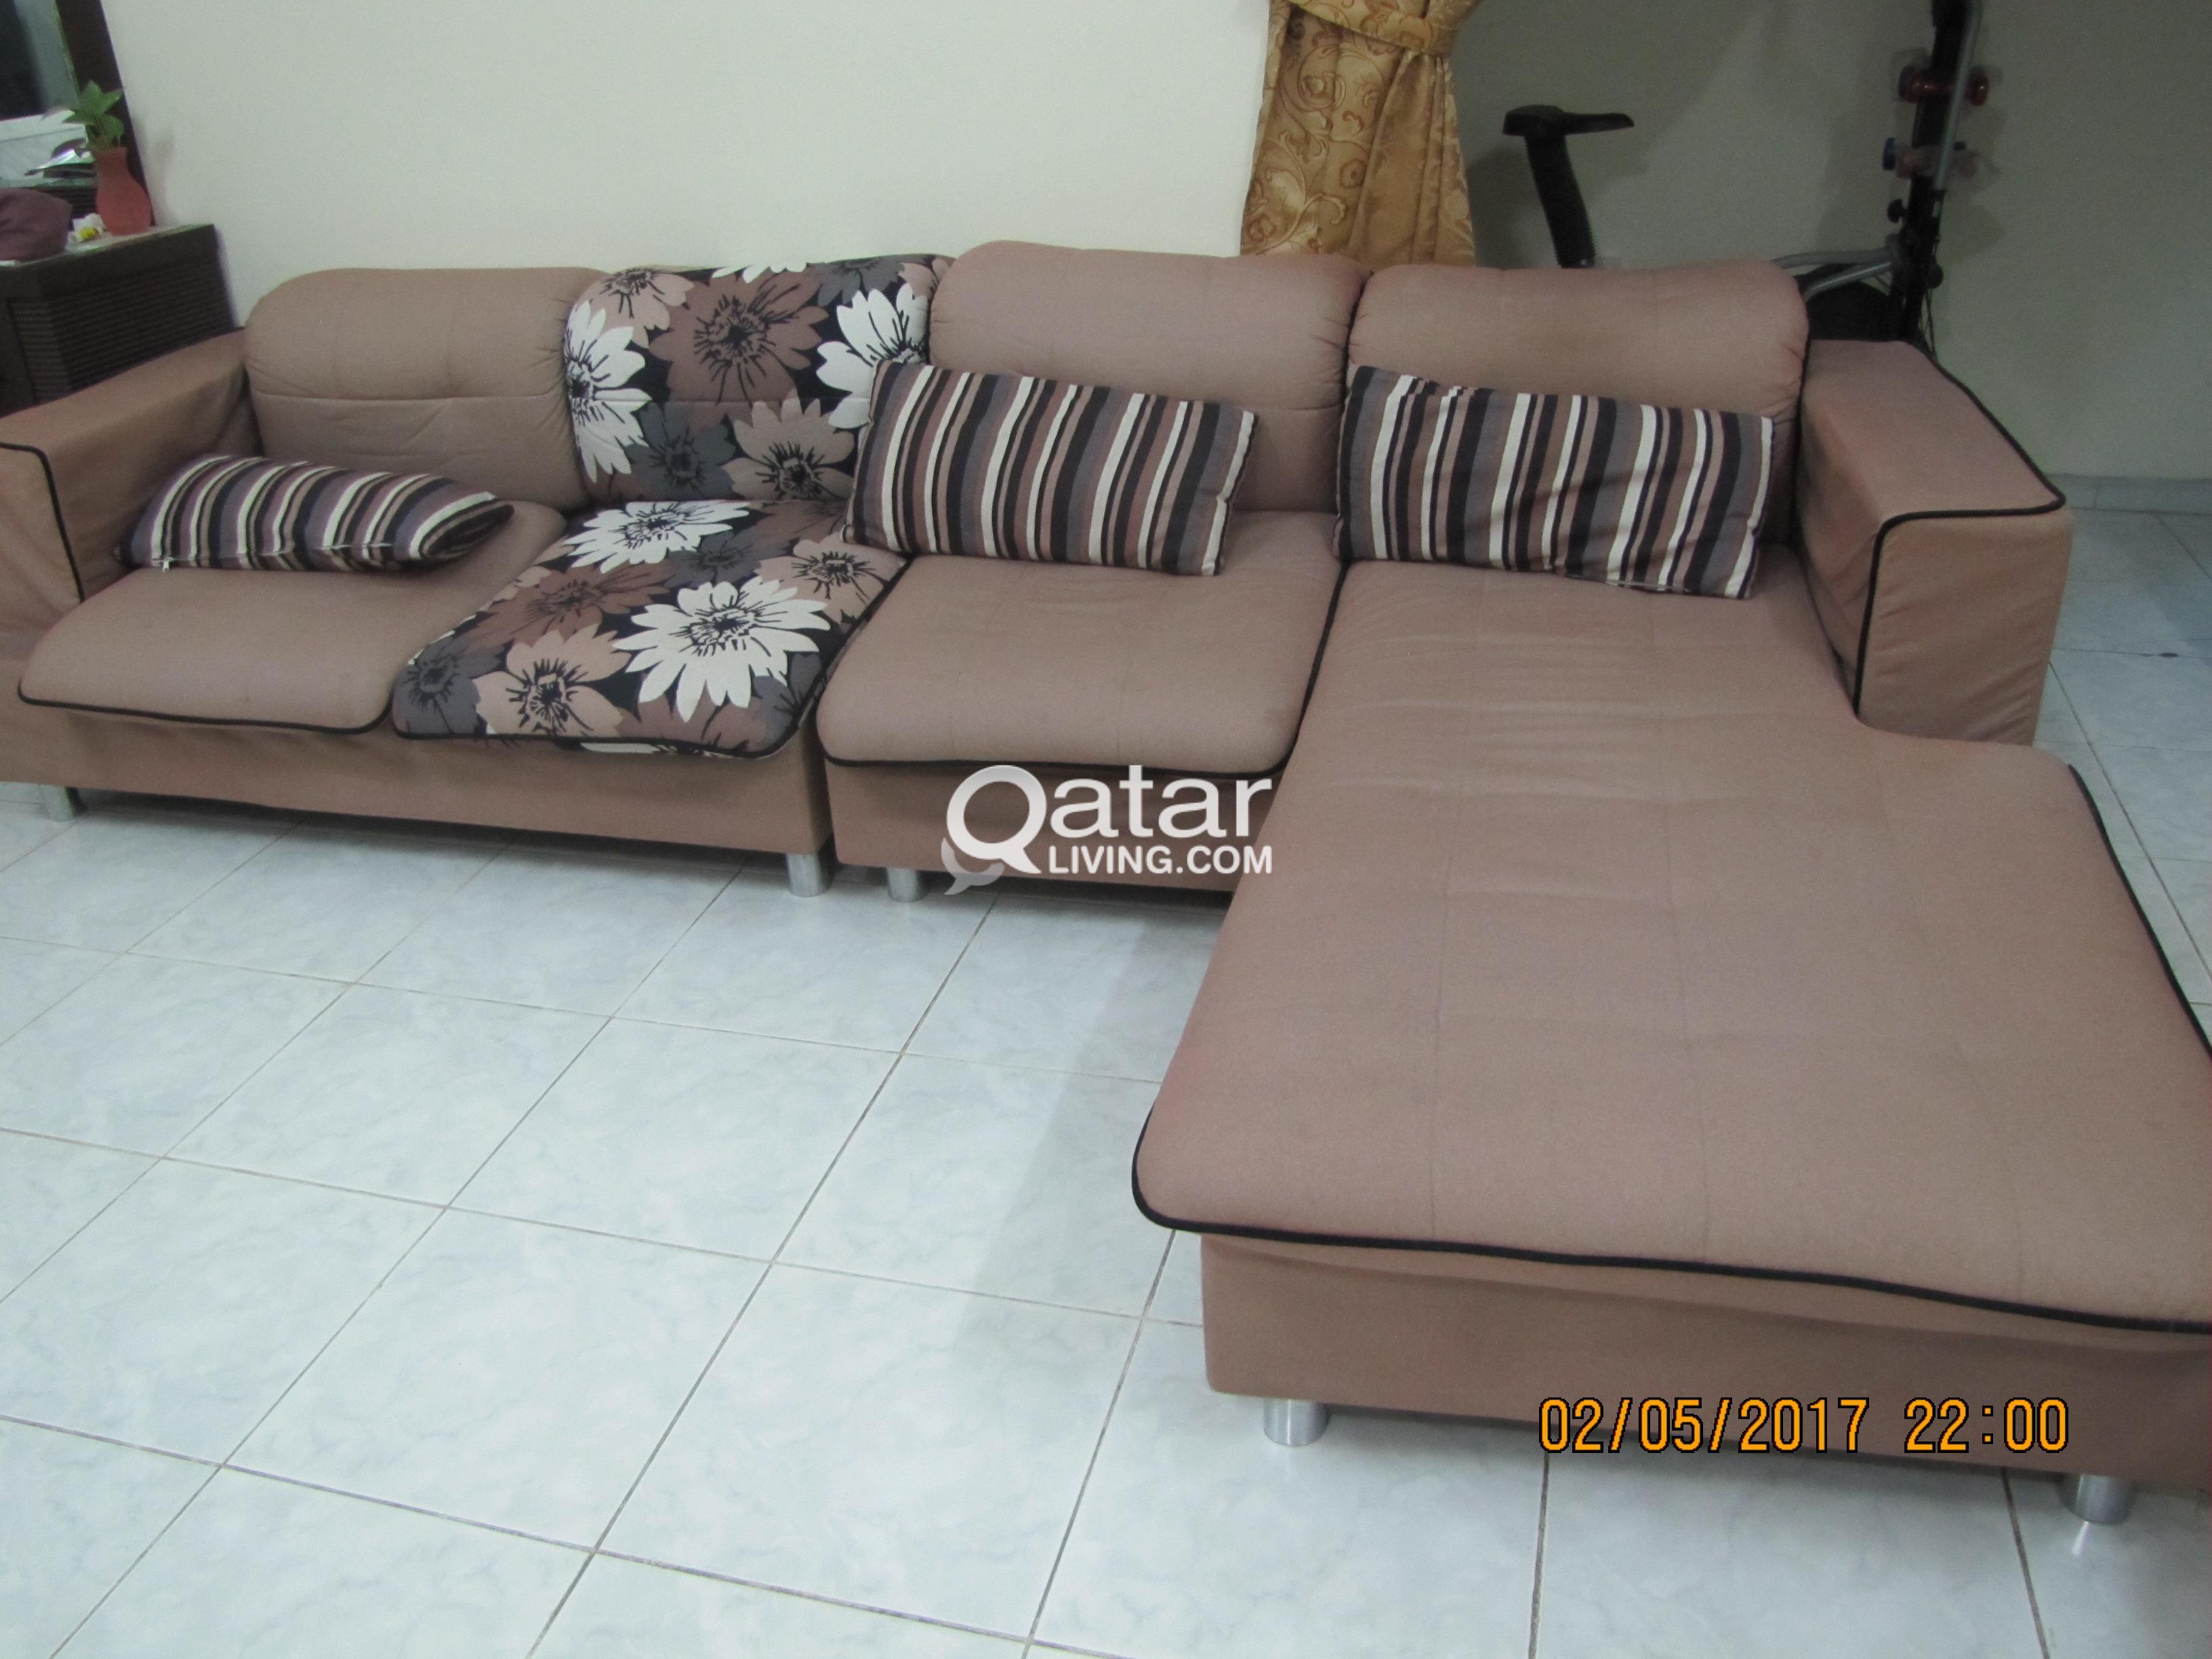 used sofa set for sale | qatar living